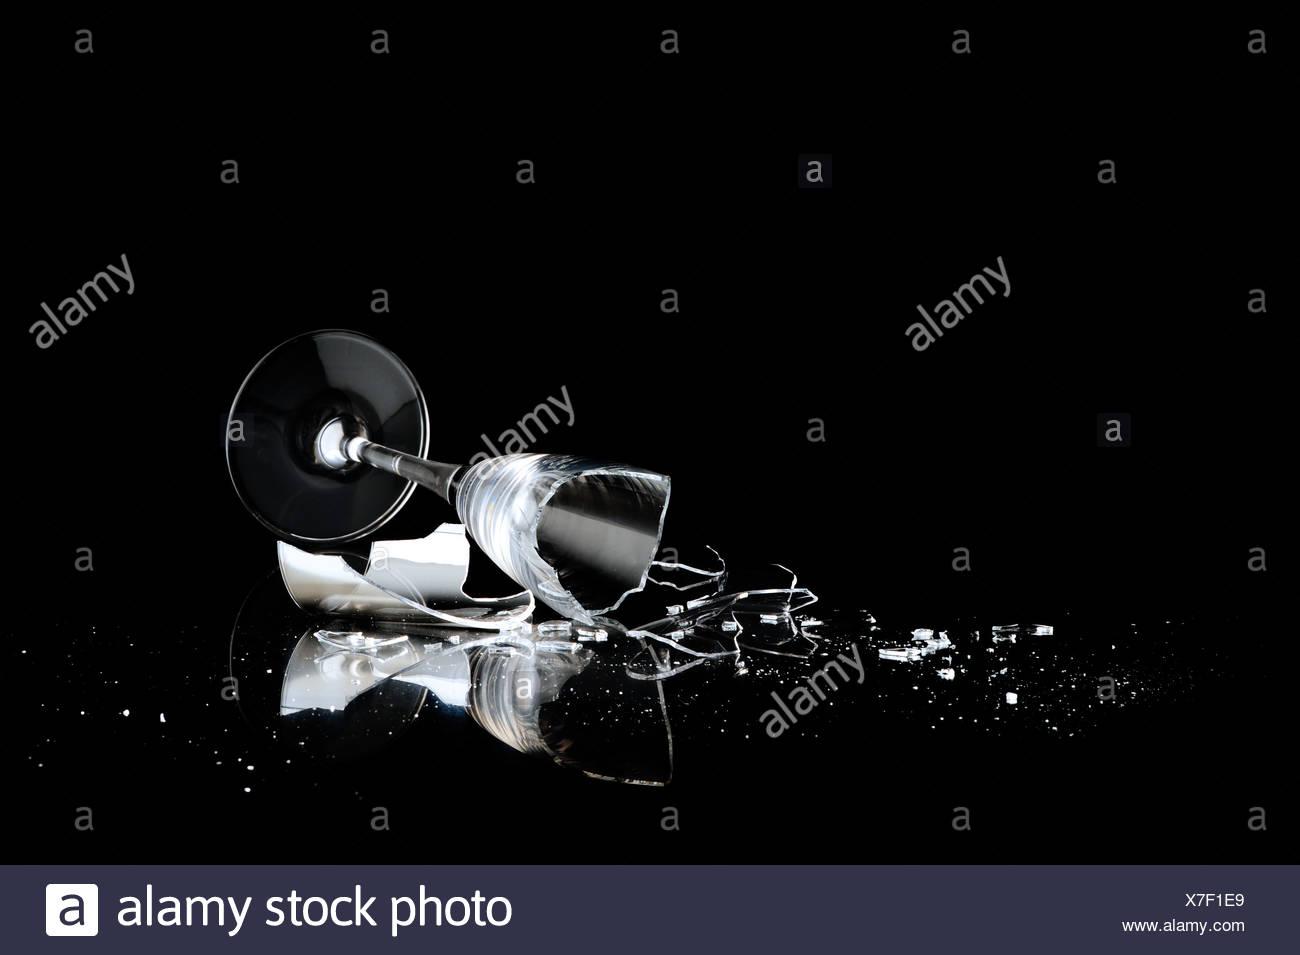 elegant wine glass broken on a dark background - Stock Image